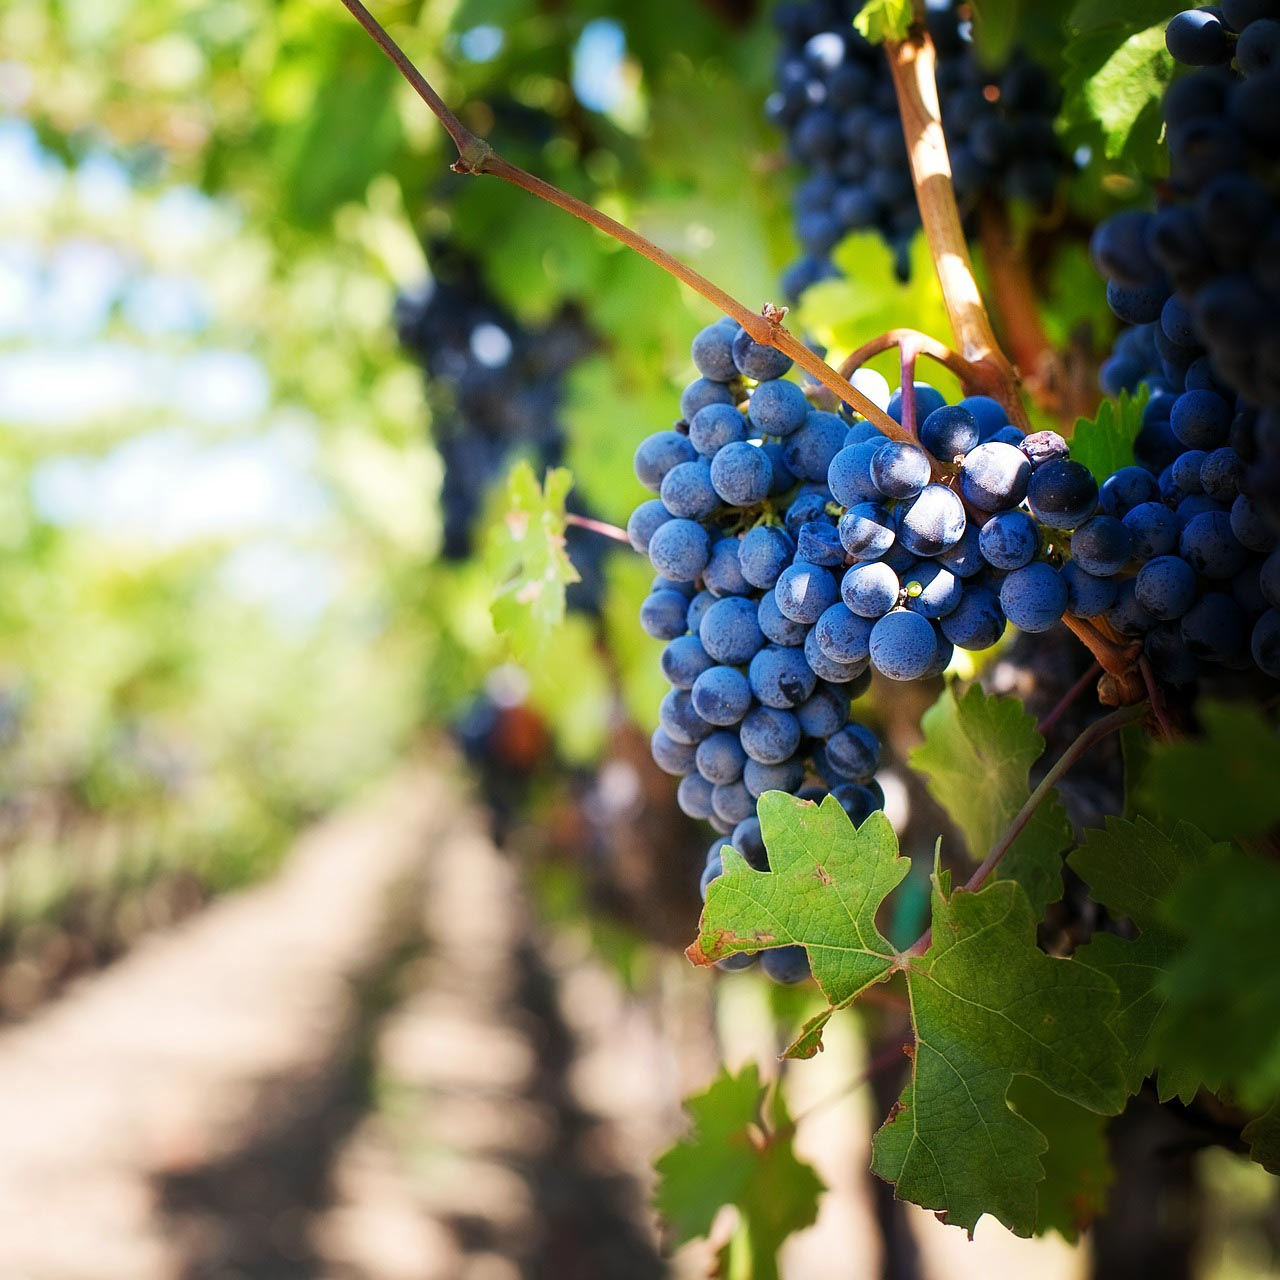 purple-grapes-553463_1920